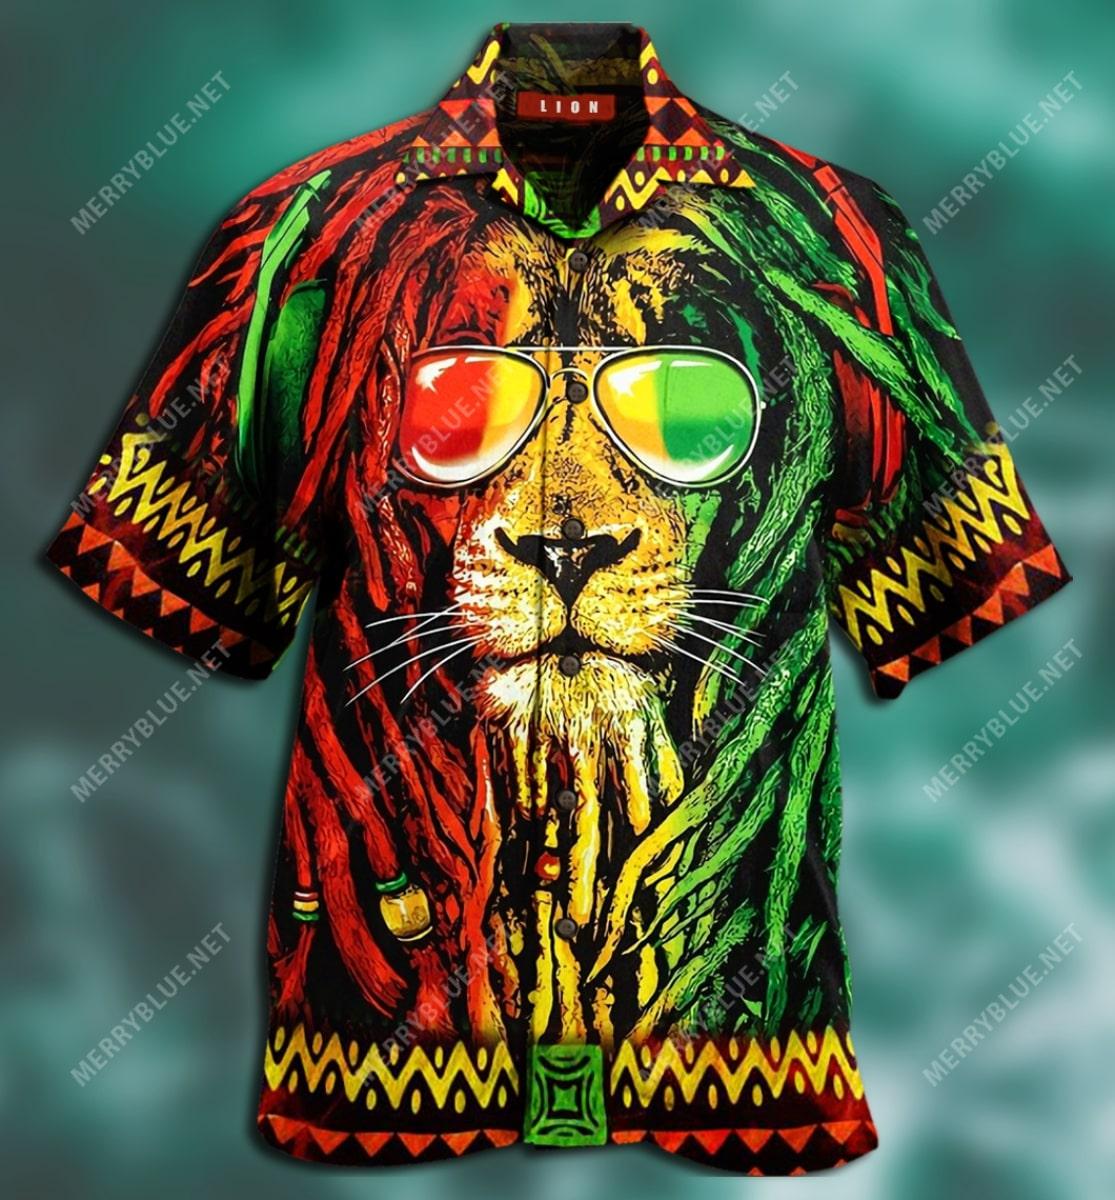 jamaica lion tropical all over printed hawaiian shirt 4